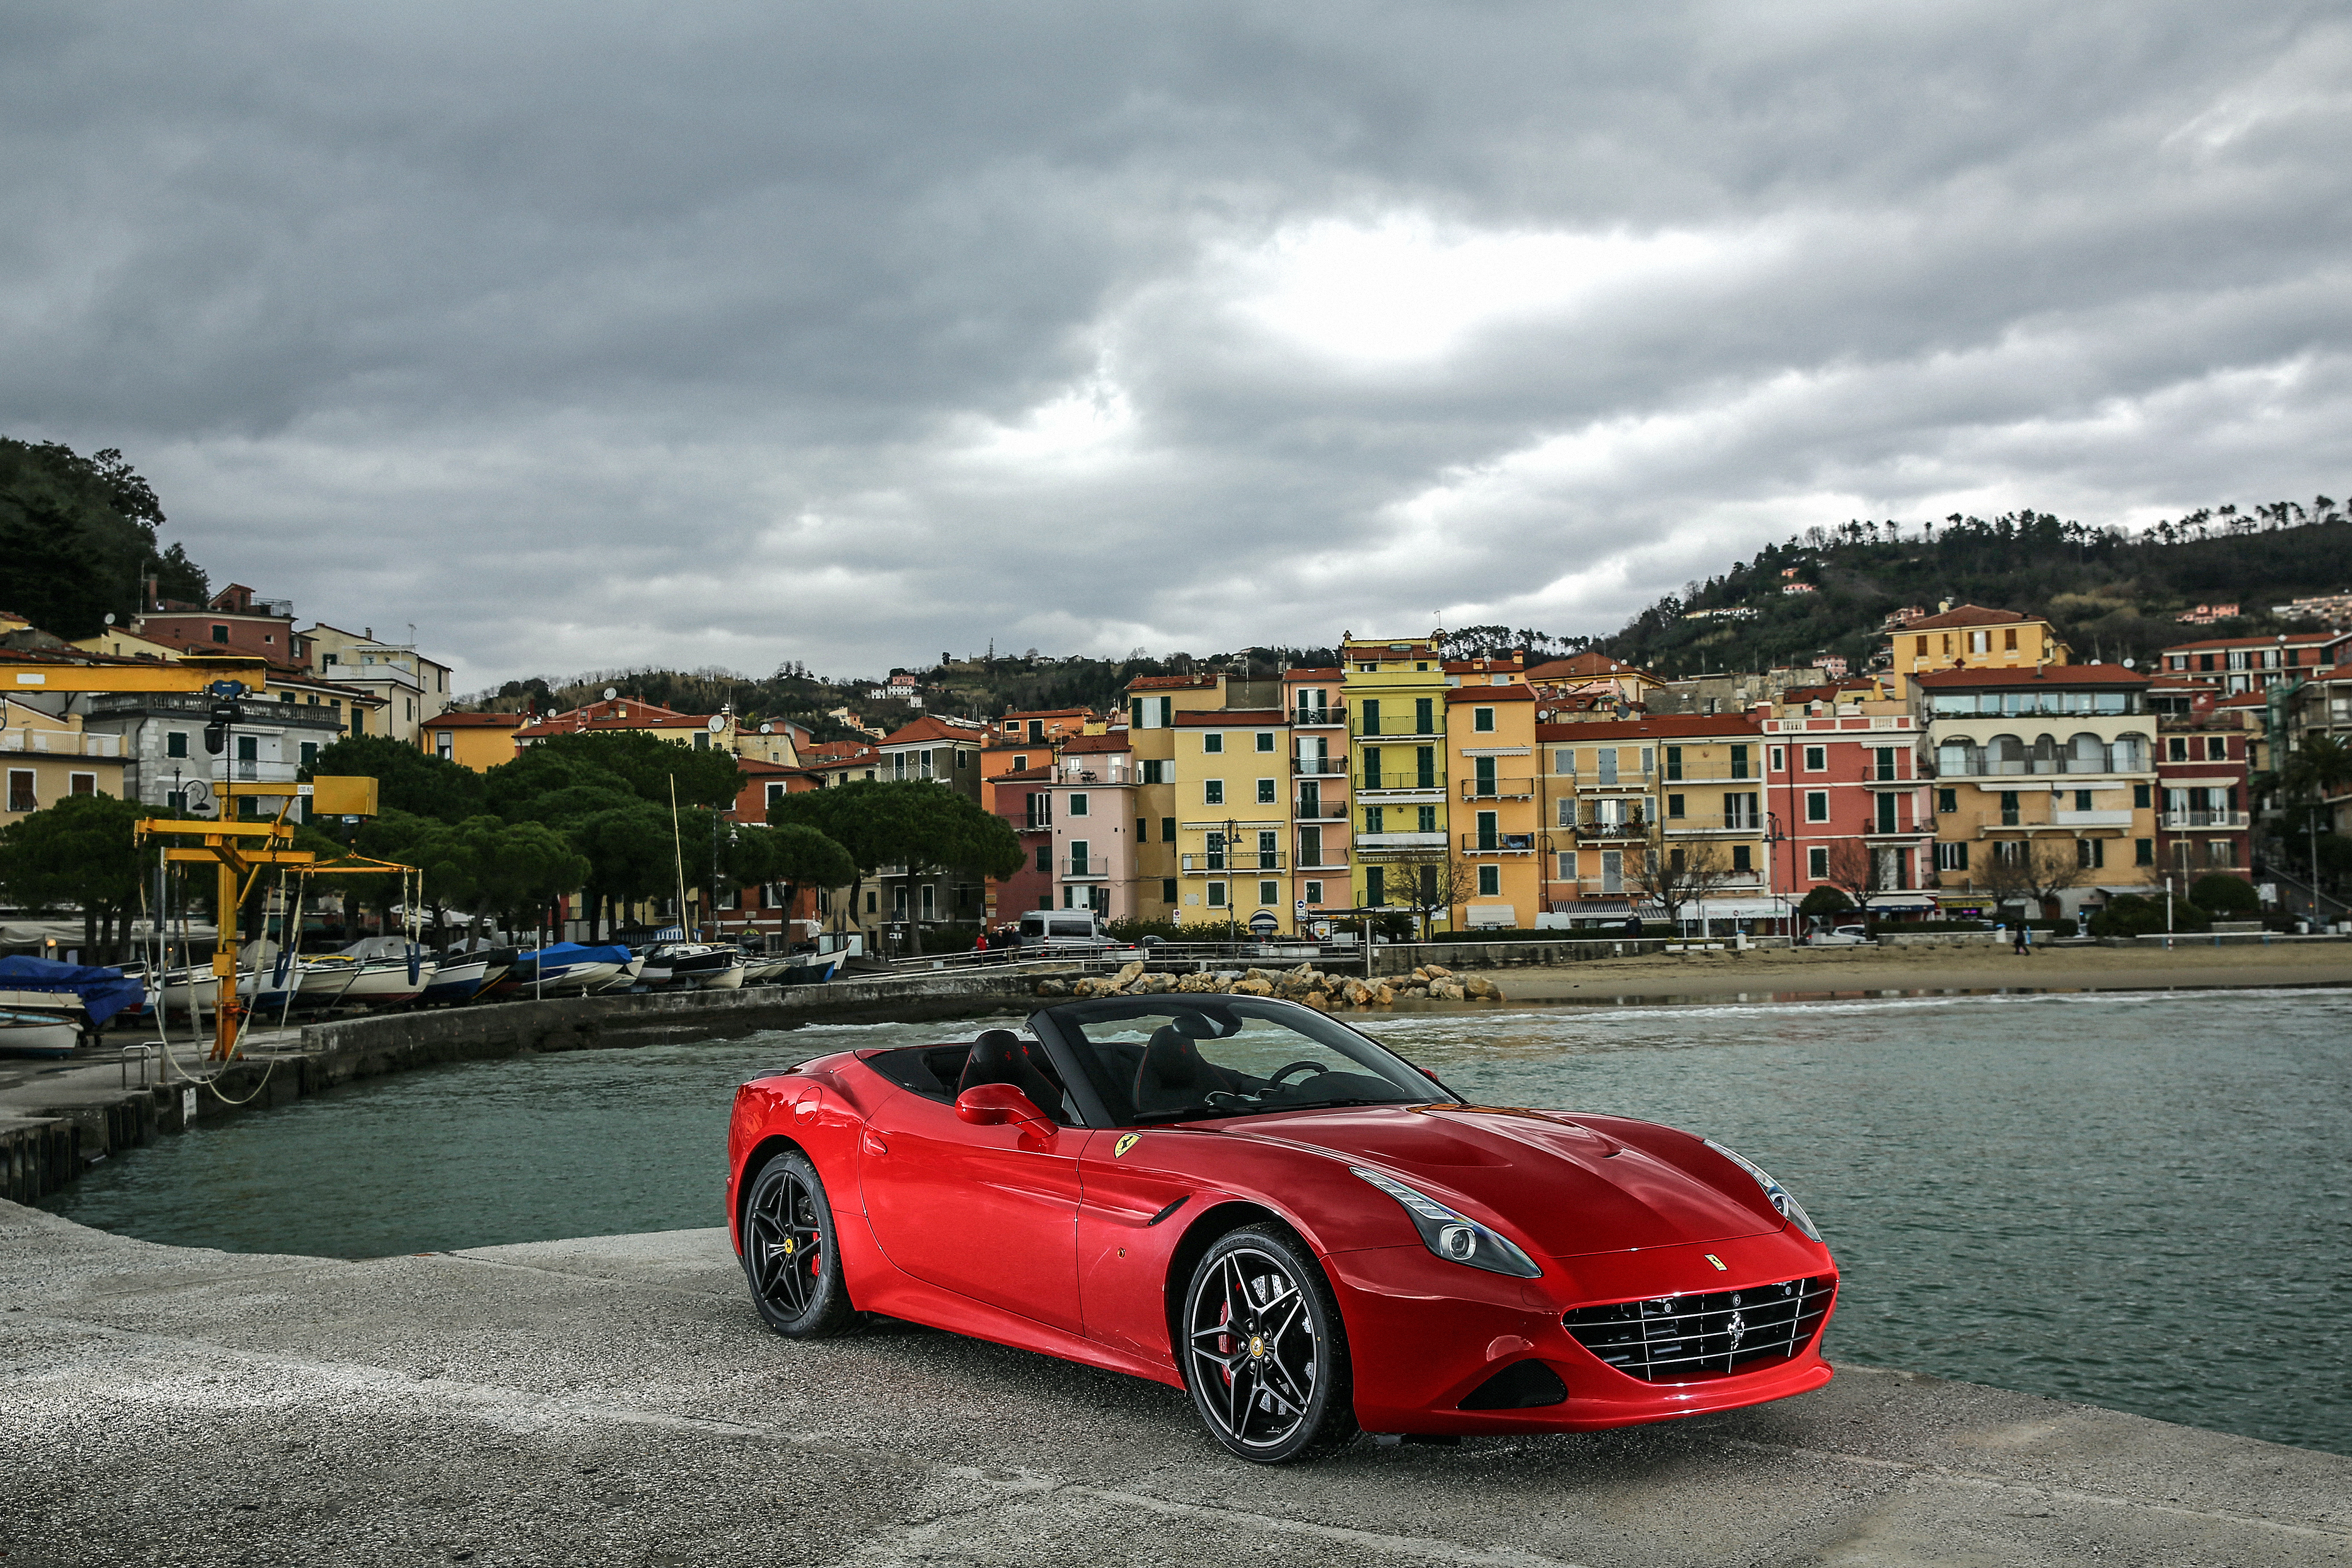 Ferrari California 4k Ultra Hd Wallpaper Background Image 4096x2731